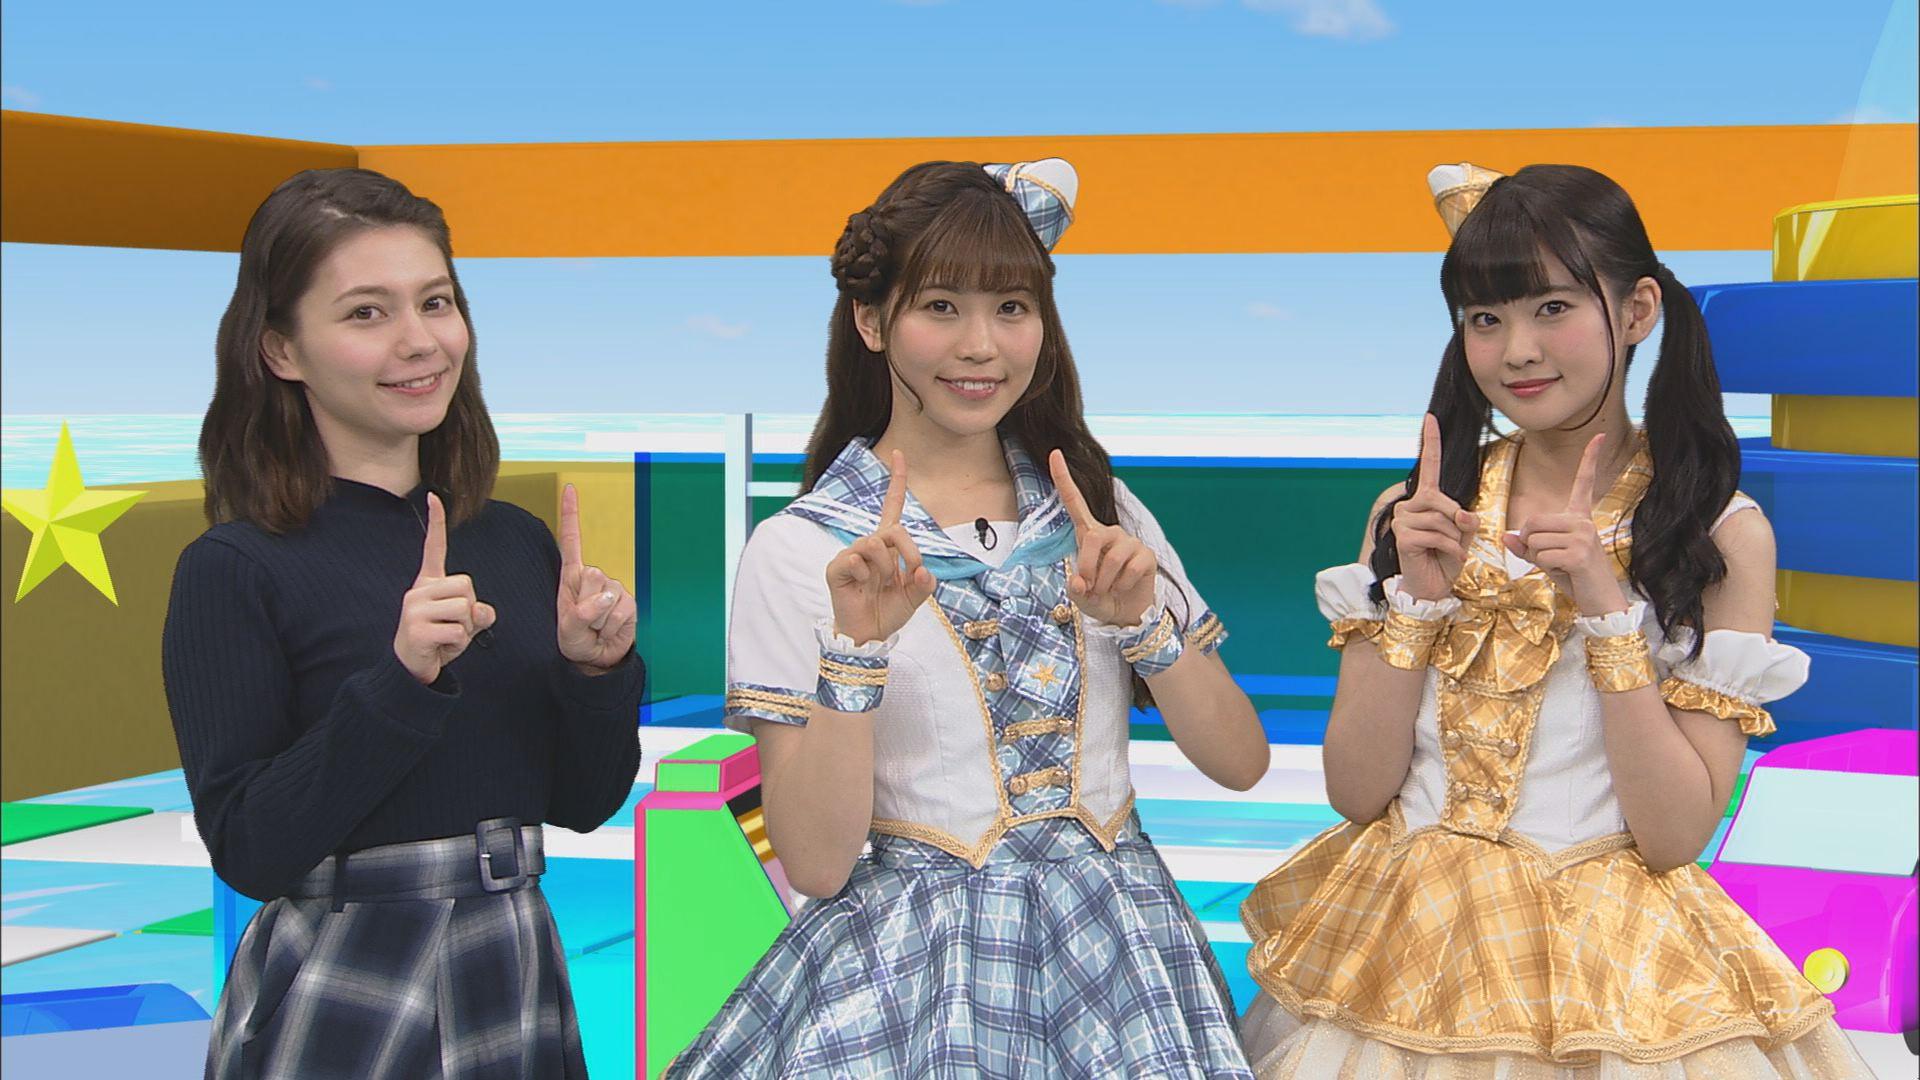 ゲスト:岩井映美里、大西亜玖璃 第179回